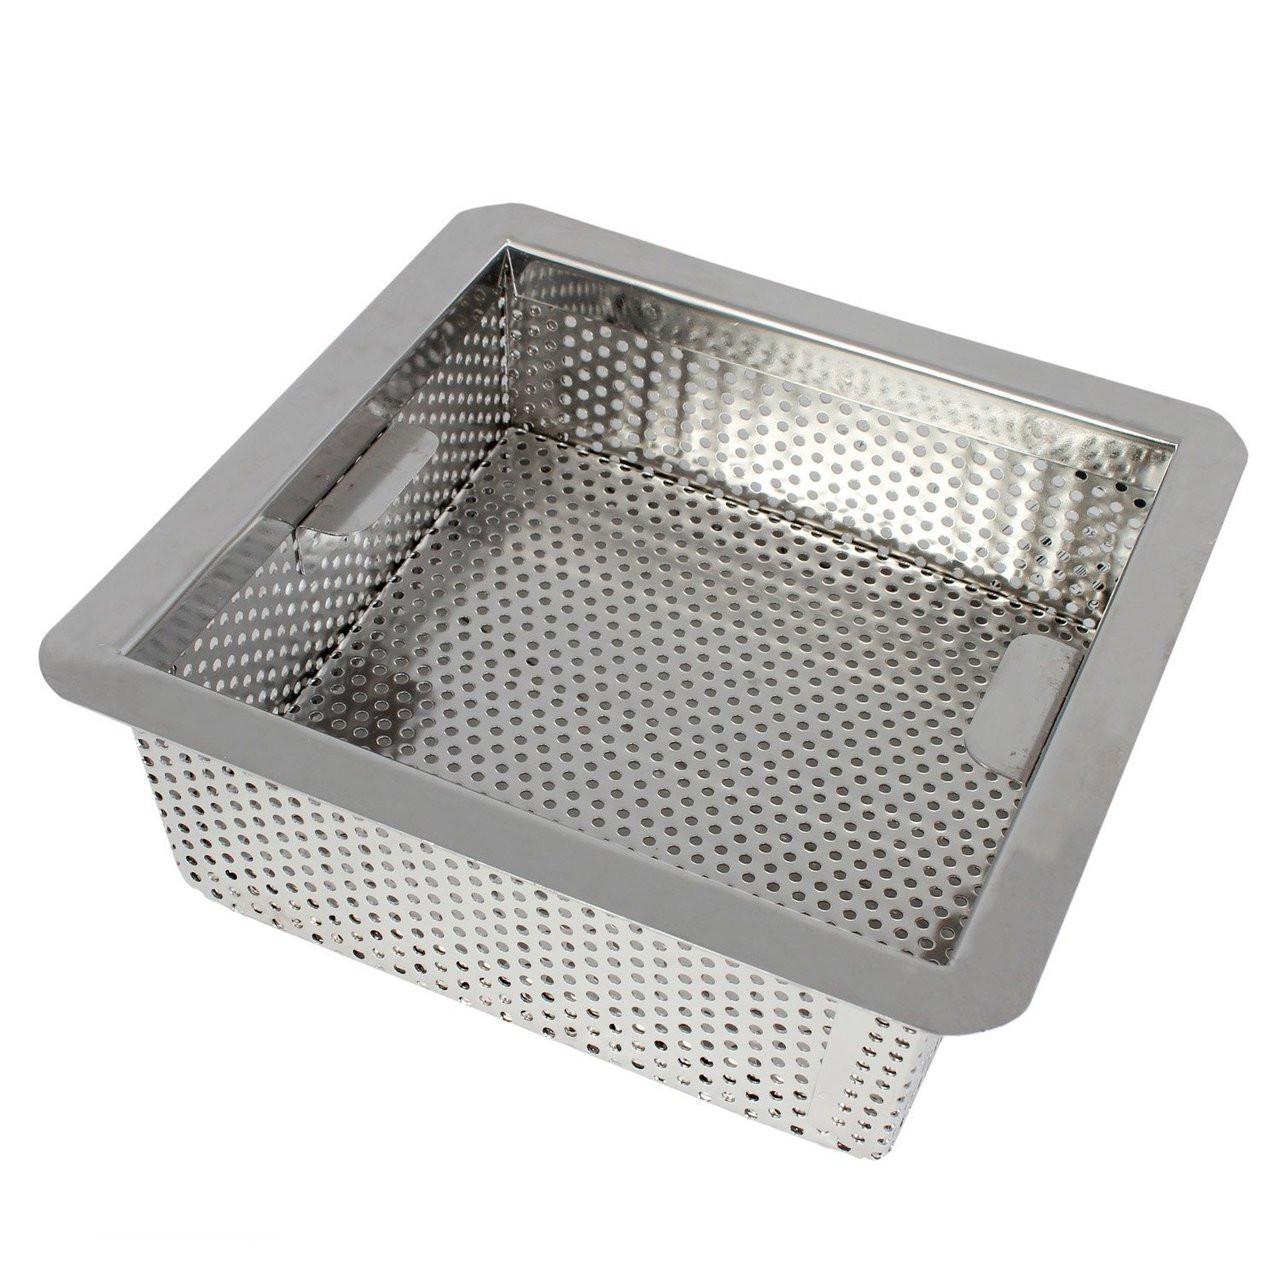 85 Stainless Steel Perforated Drain Bucket  DrainNet